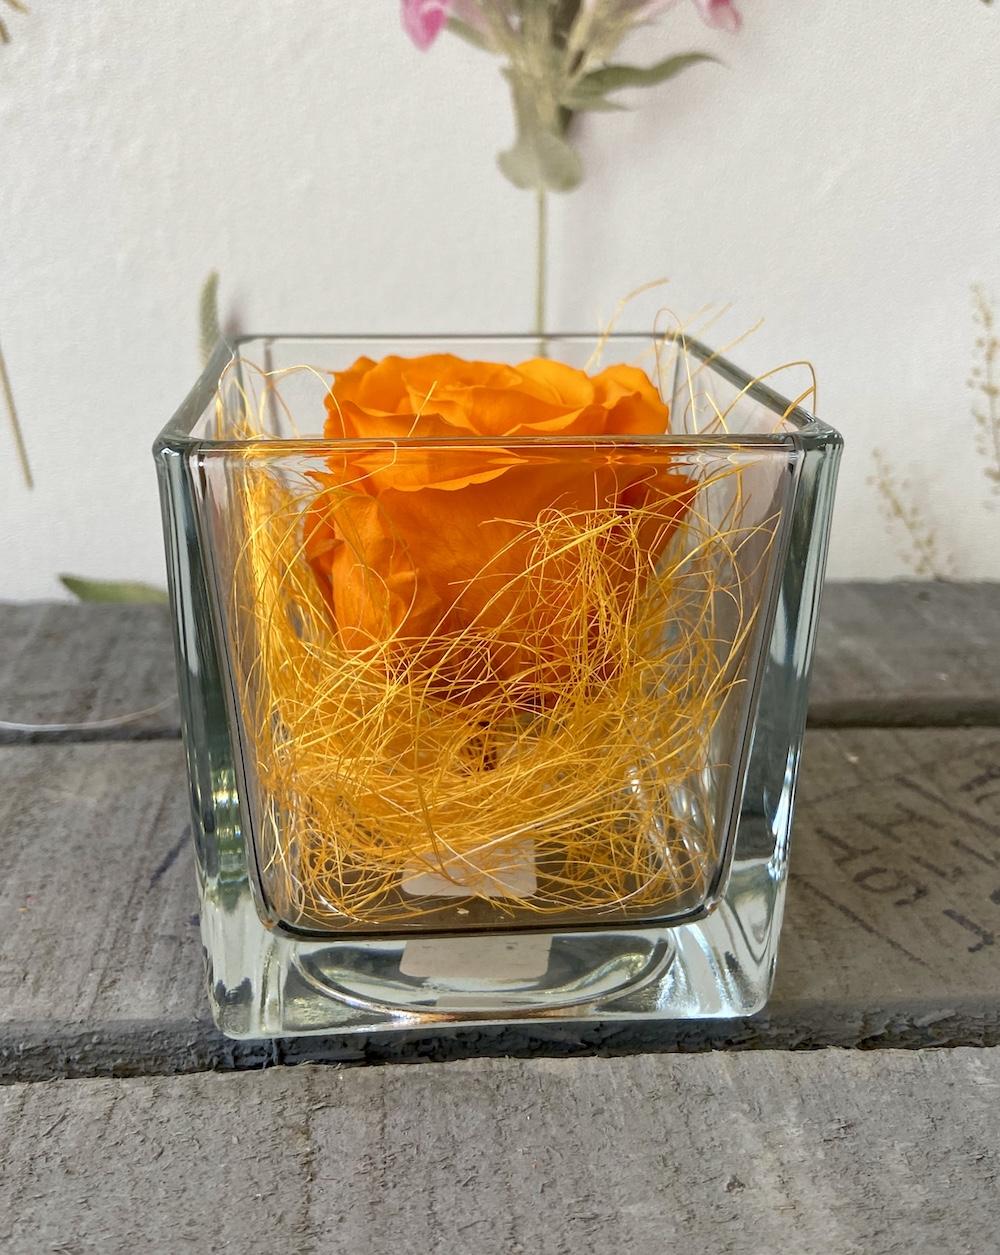 arancioflower box rose stabilizzate florashopping Rossana flower store NovellinoIMG_0466